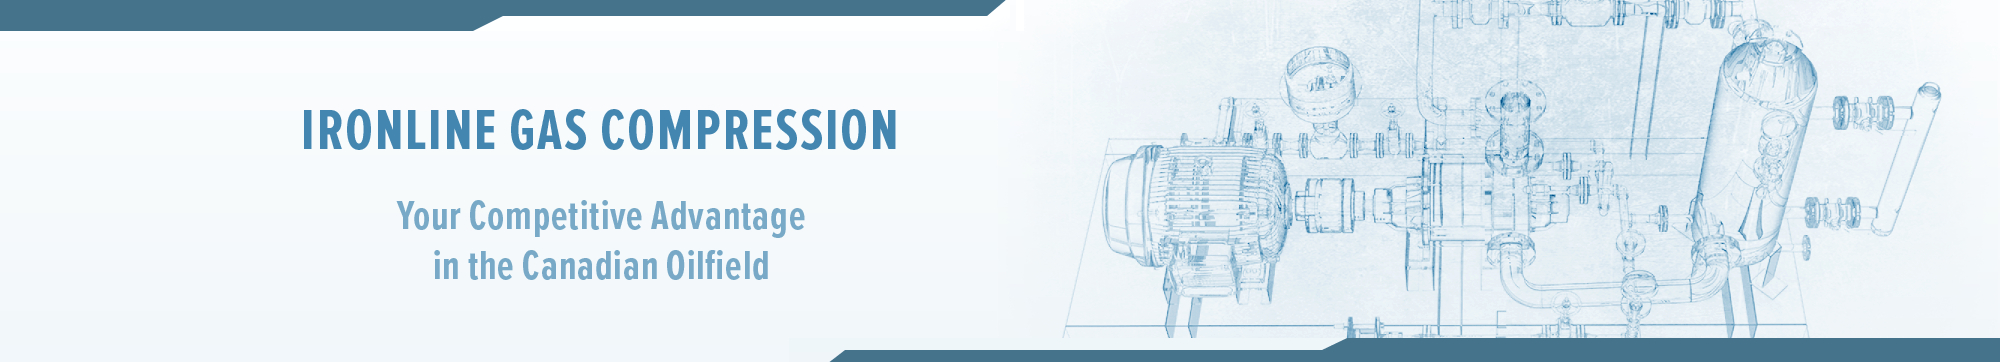 ironline compression logo